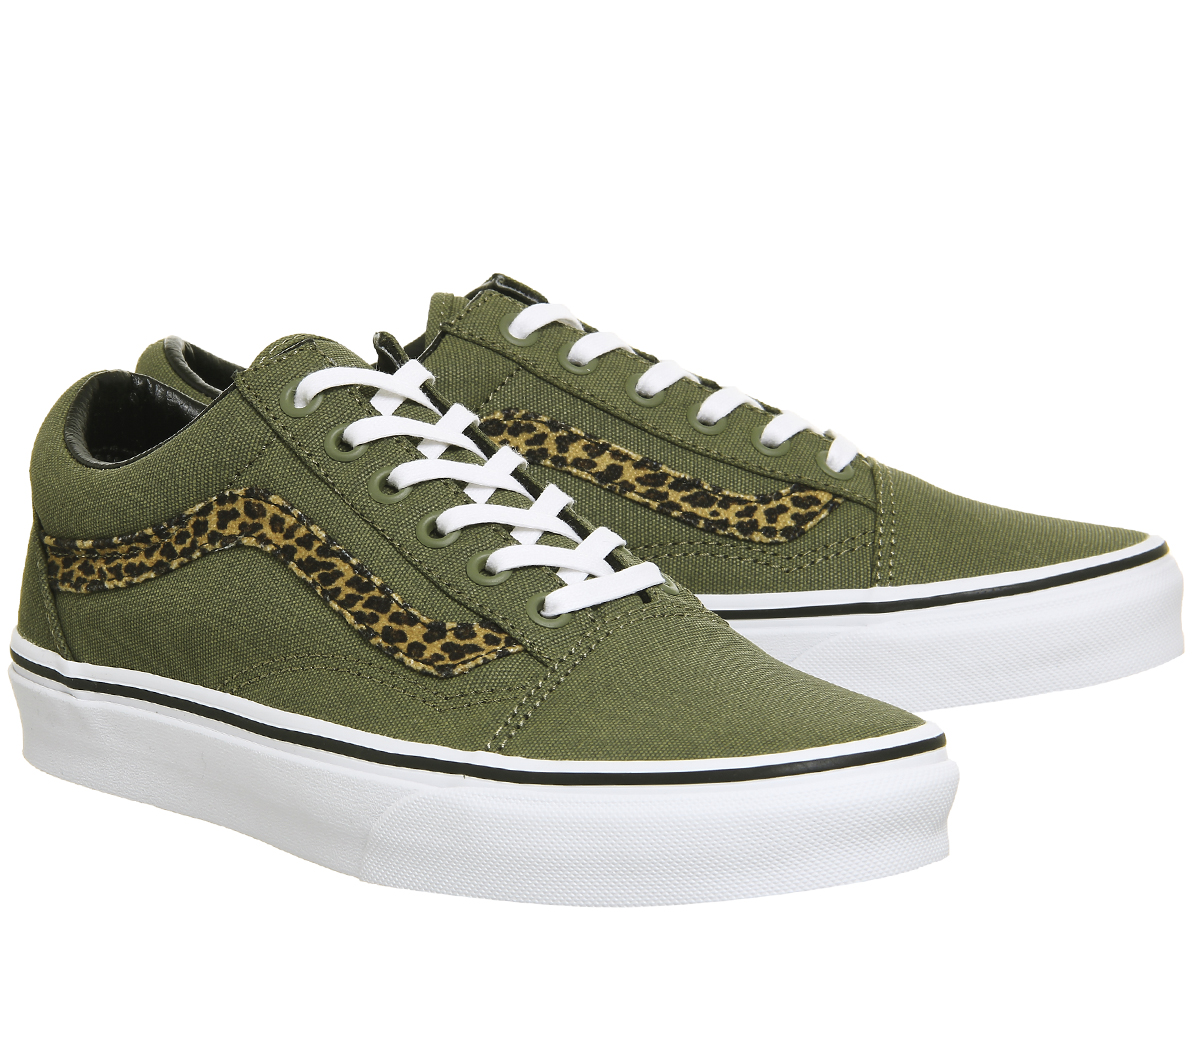 3e08f321066 Womens Vans Old Skool Trainers MINI LEOPARD ARMY GREEN WHITE ...